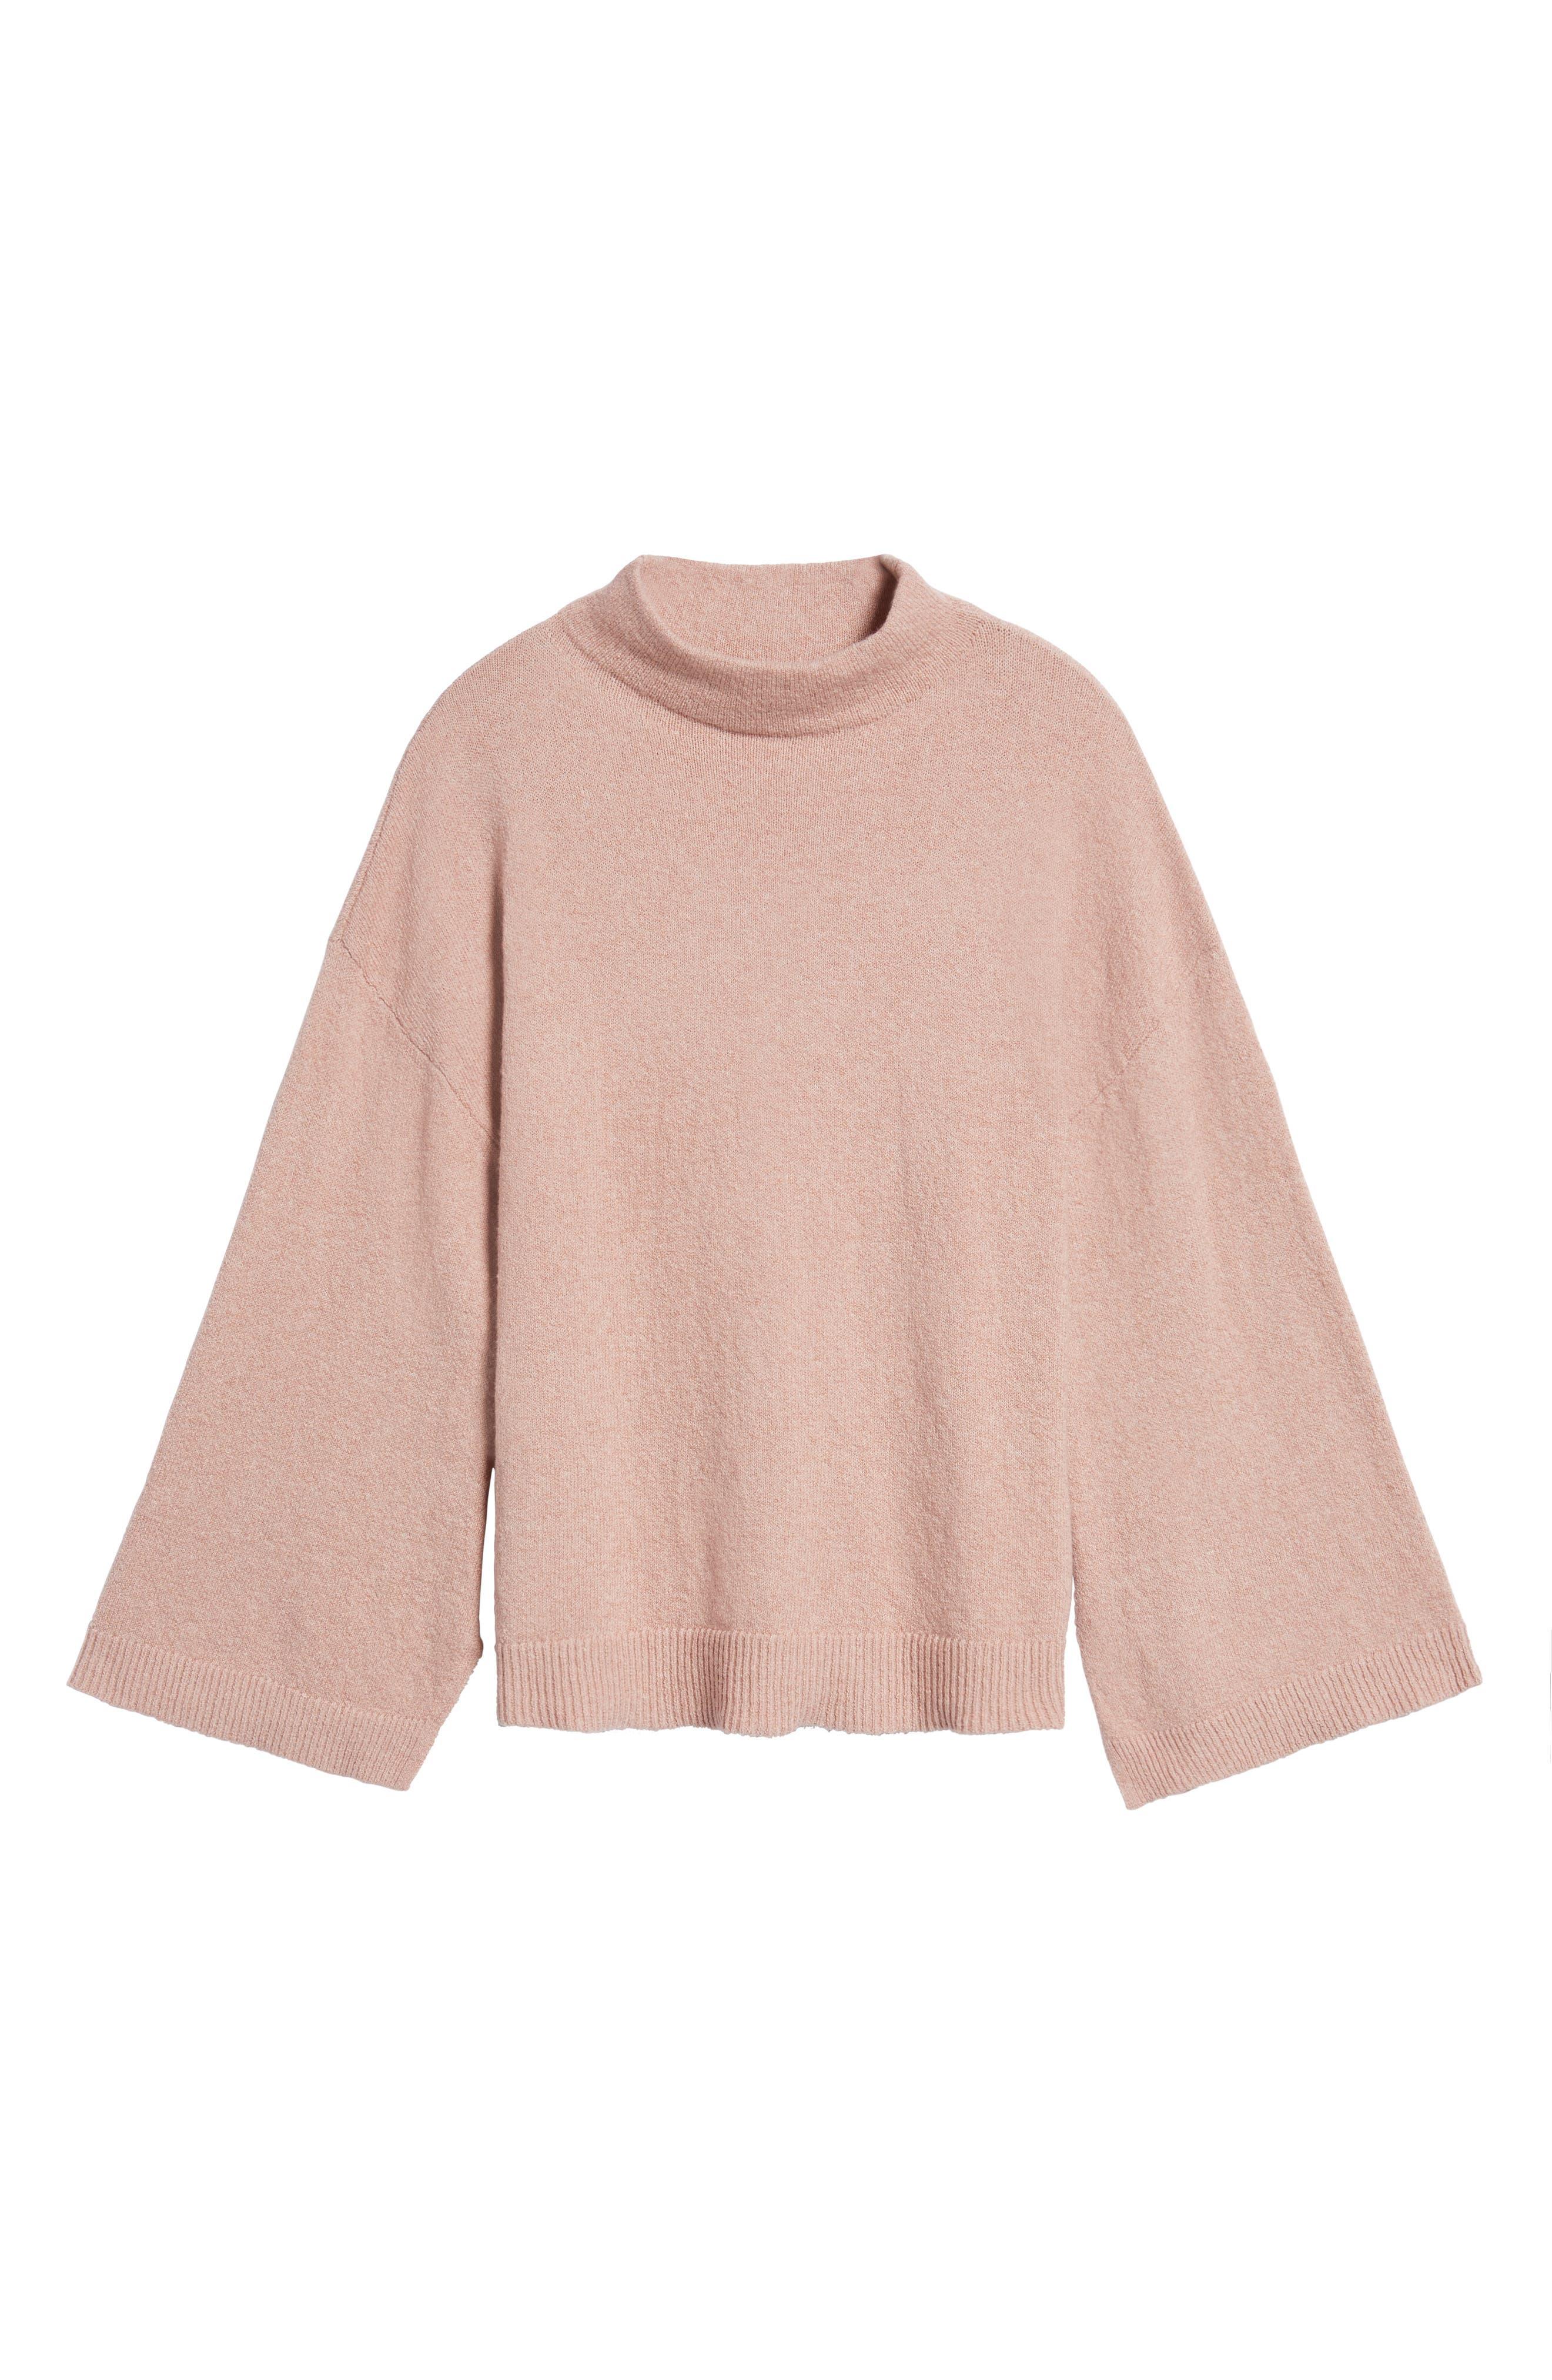 Dolman Sleeve Sweater,                             Alternate thumbnail 24, color,